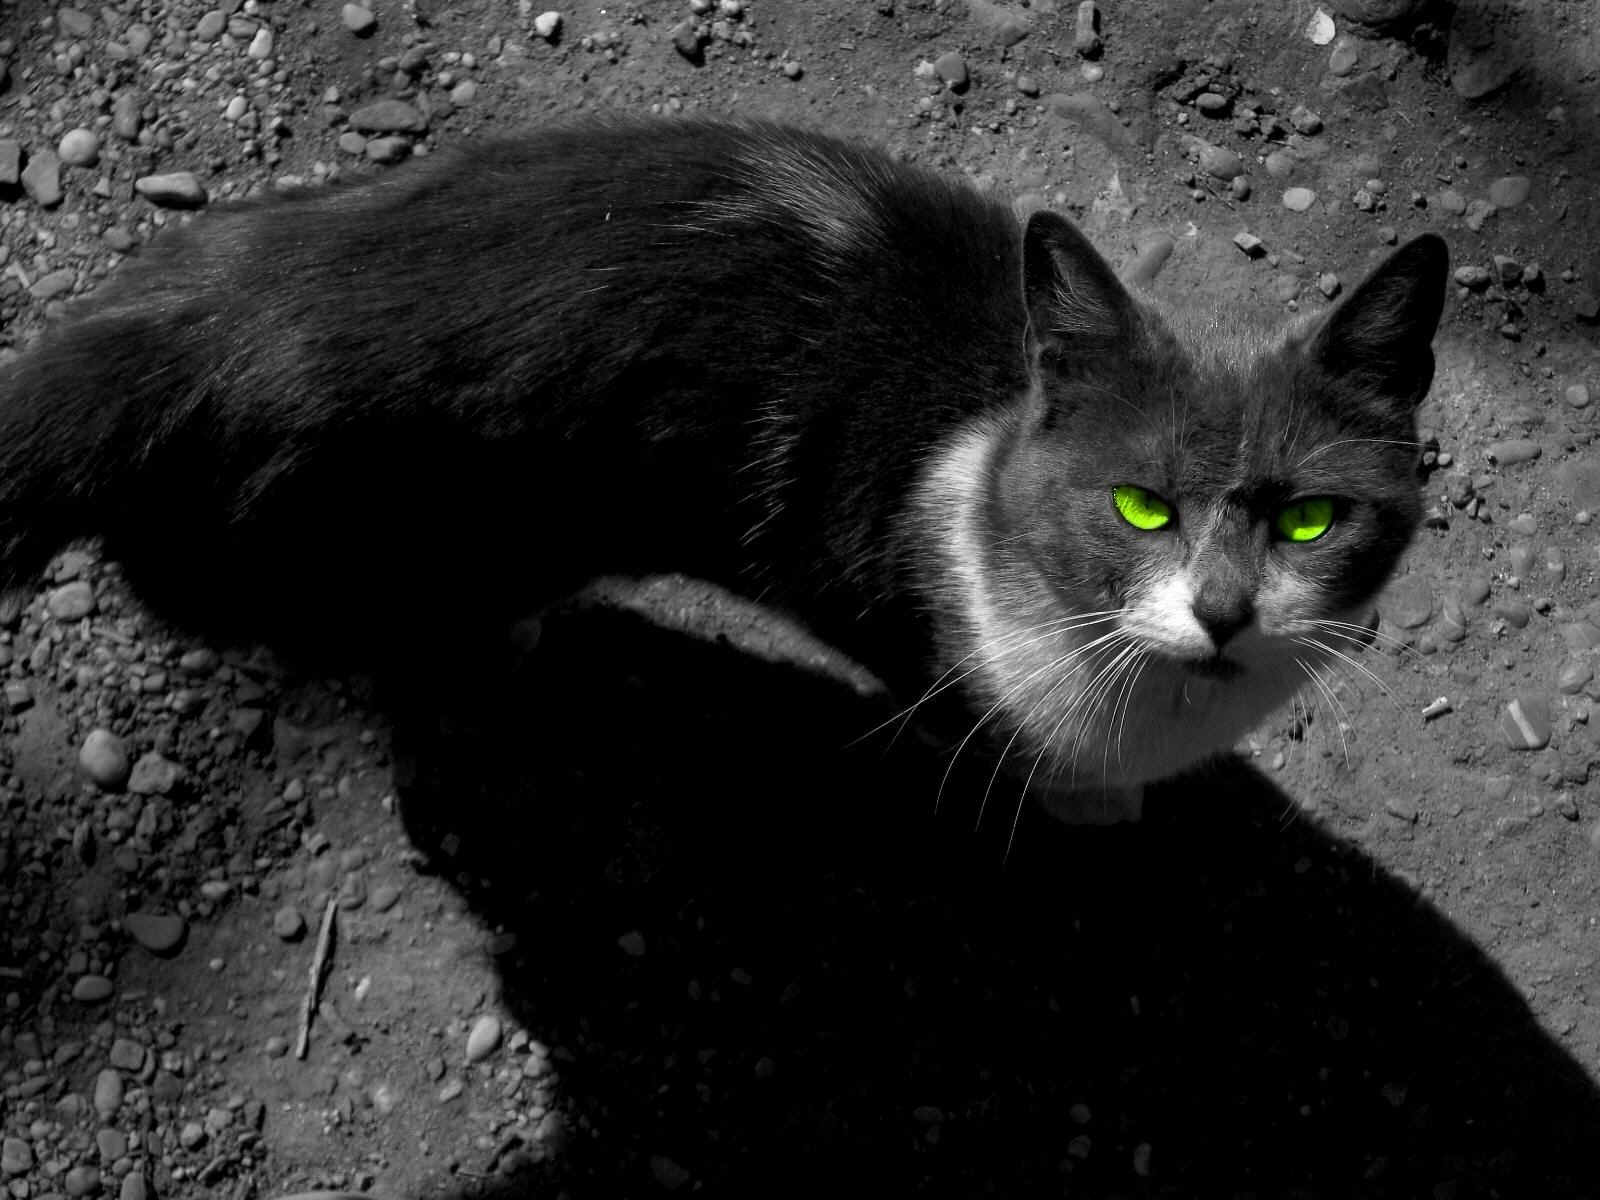 hd warrior cats image | sharovarka | pinterest | warrior cats